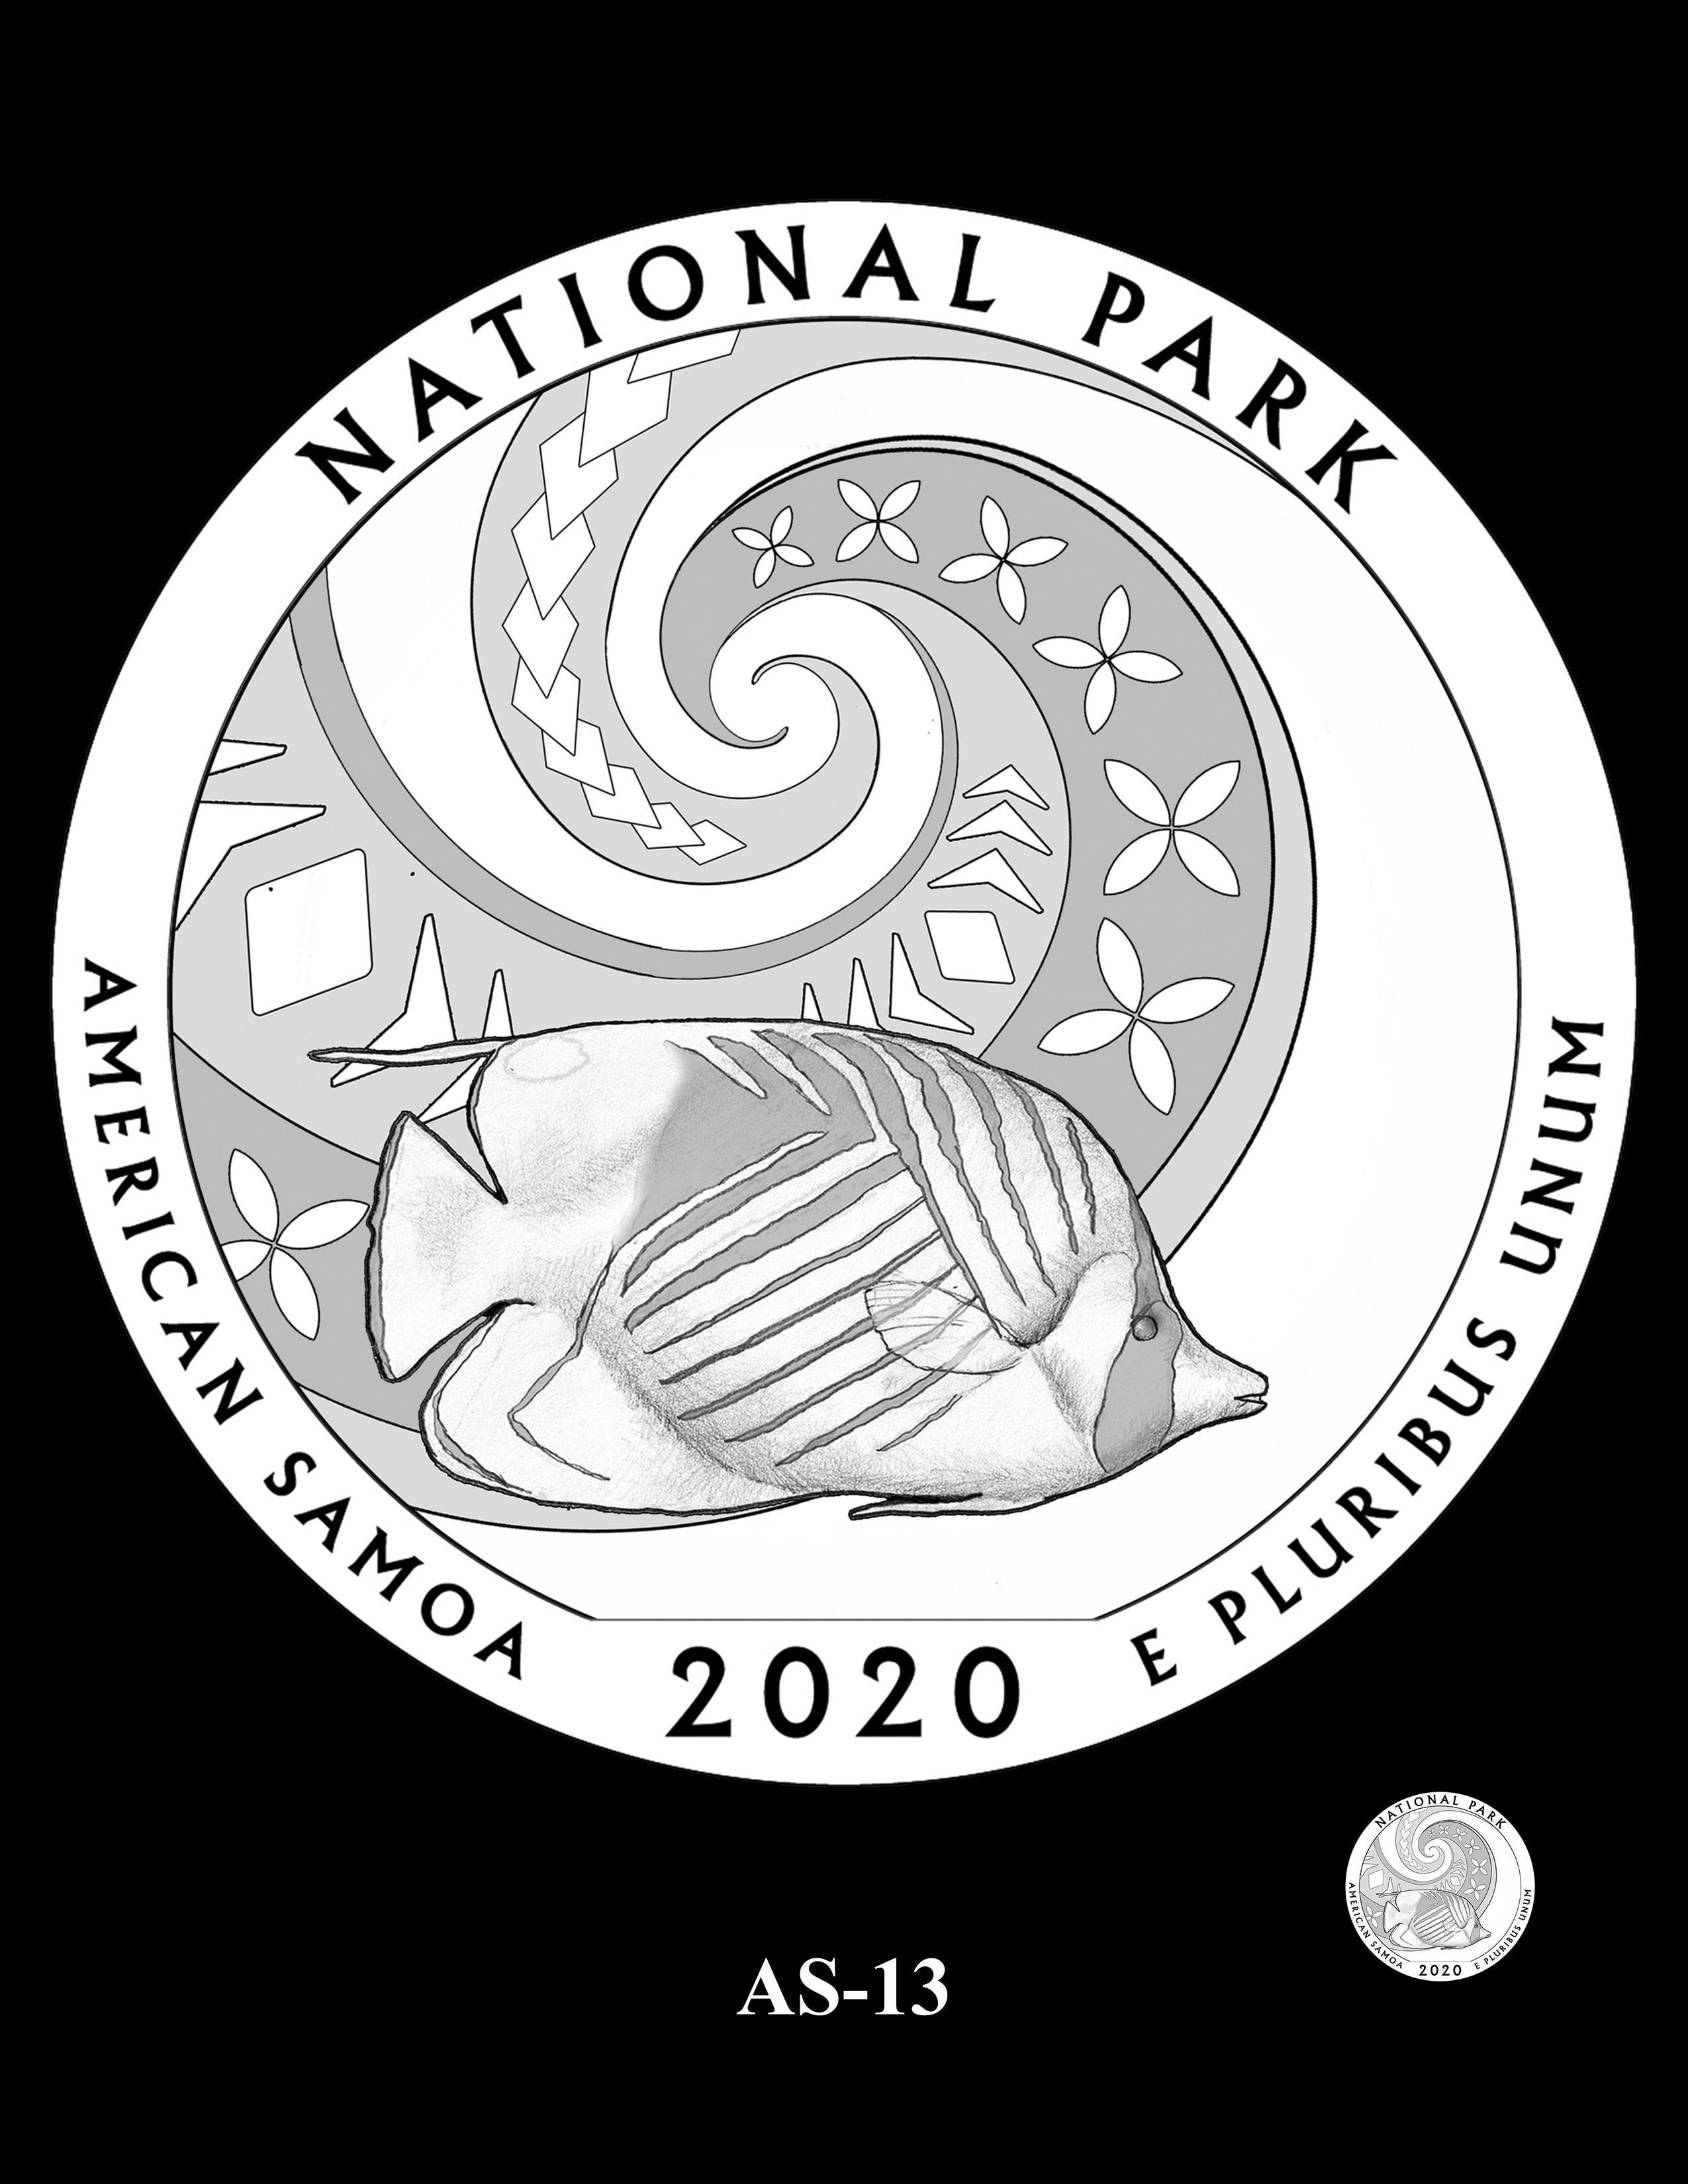 AS-13 -- 2020 America the Beautiful Quarters® Program